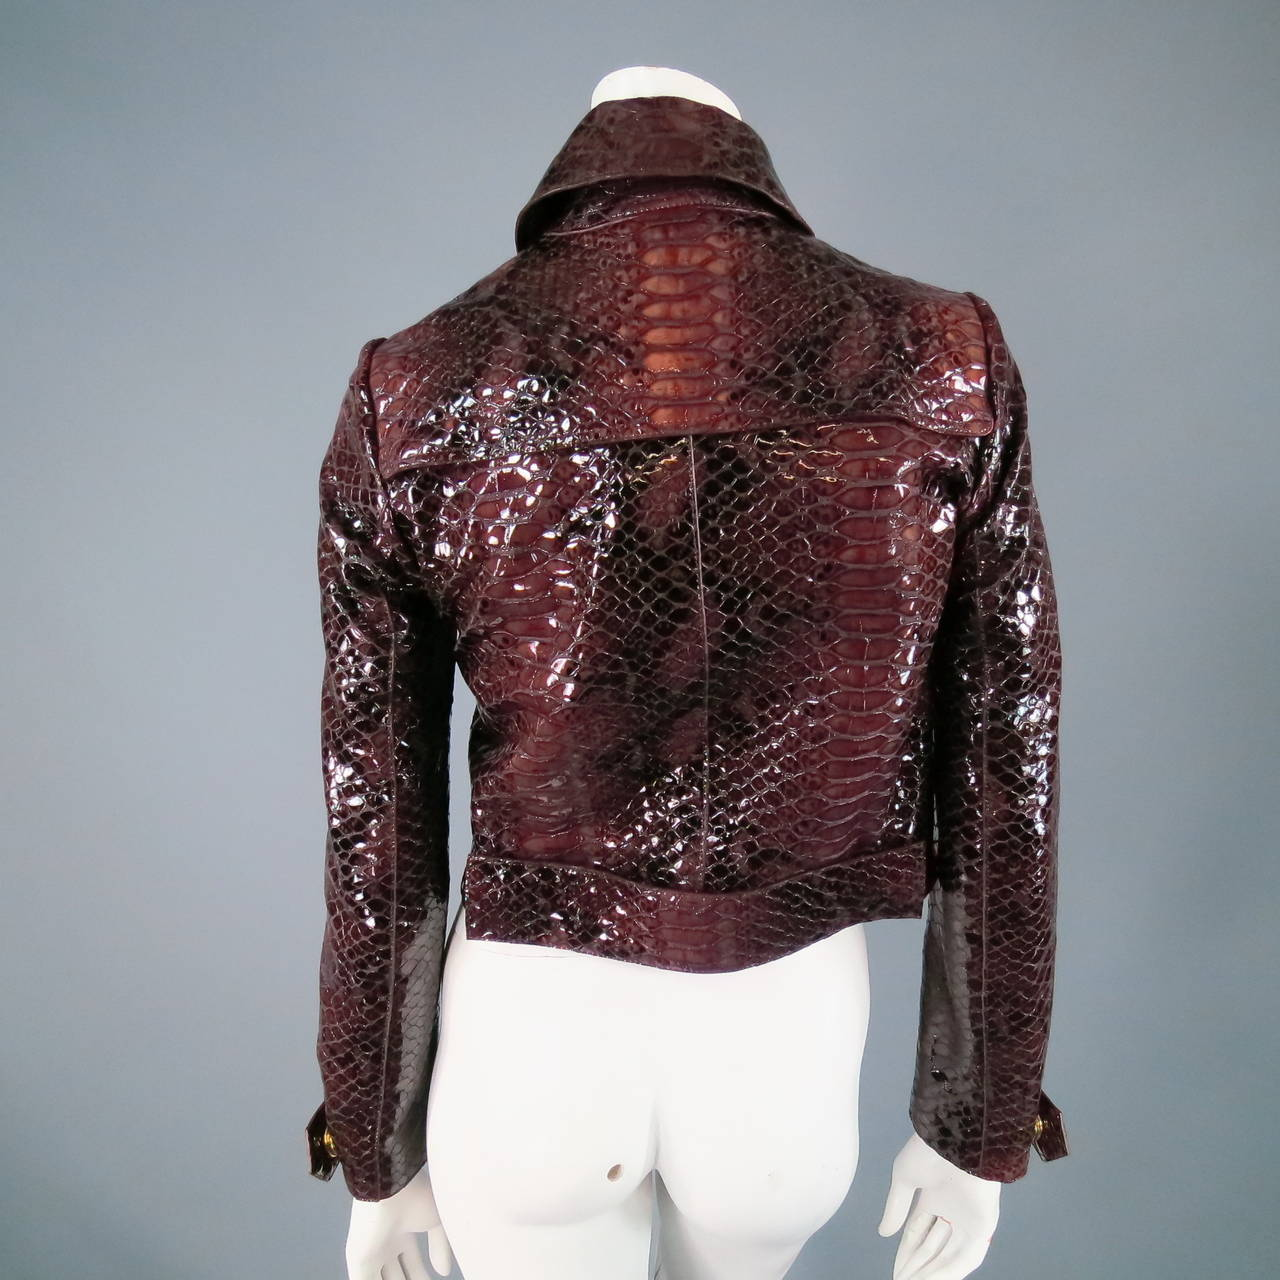 2013's BURBERRY PRORSUM Size 4 Burgundy Python Embossed Patent Leather Jacket 5